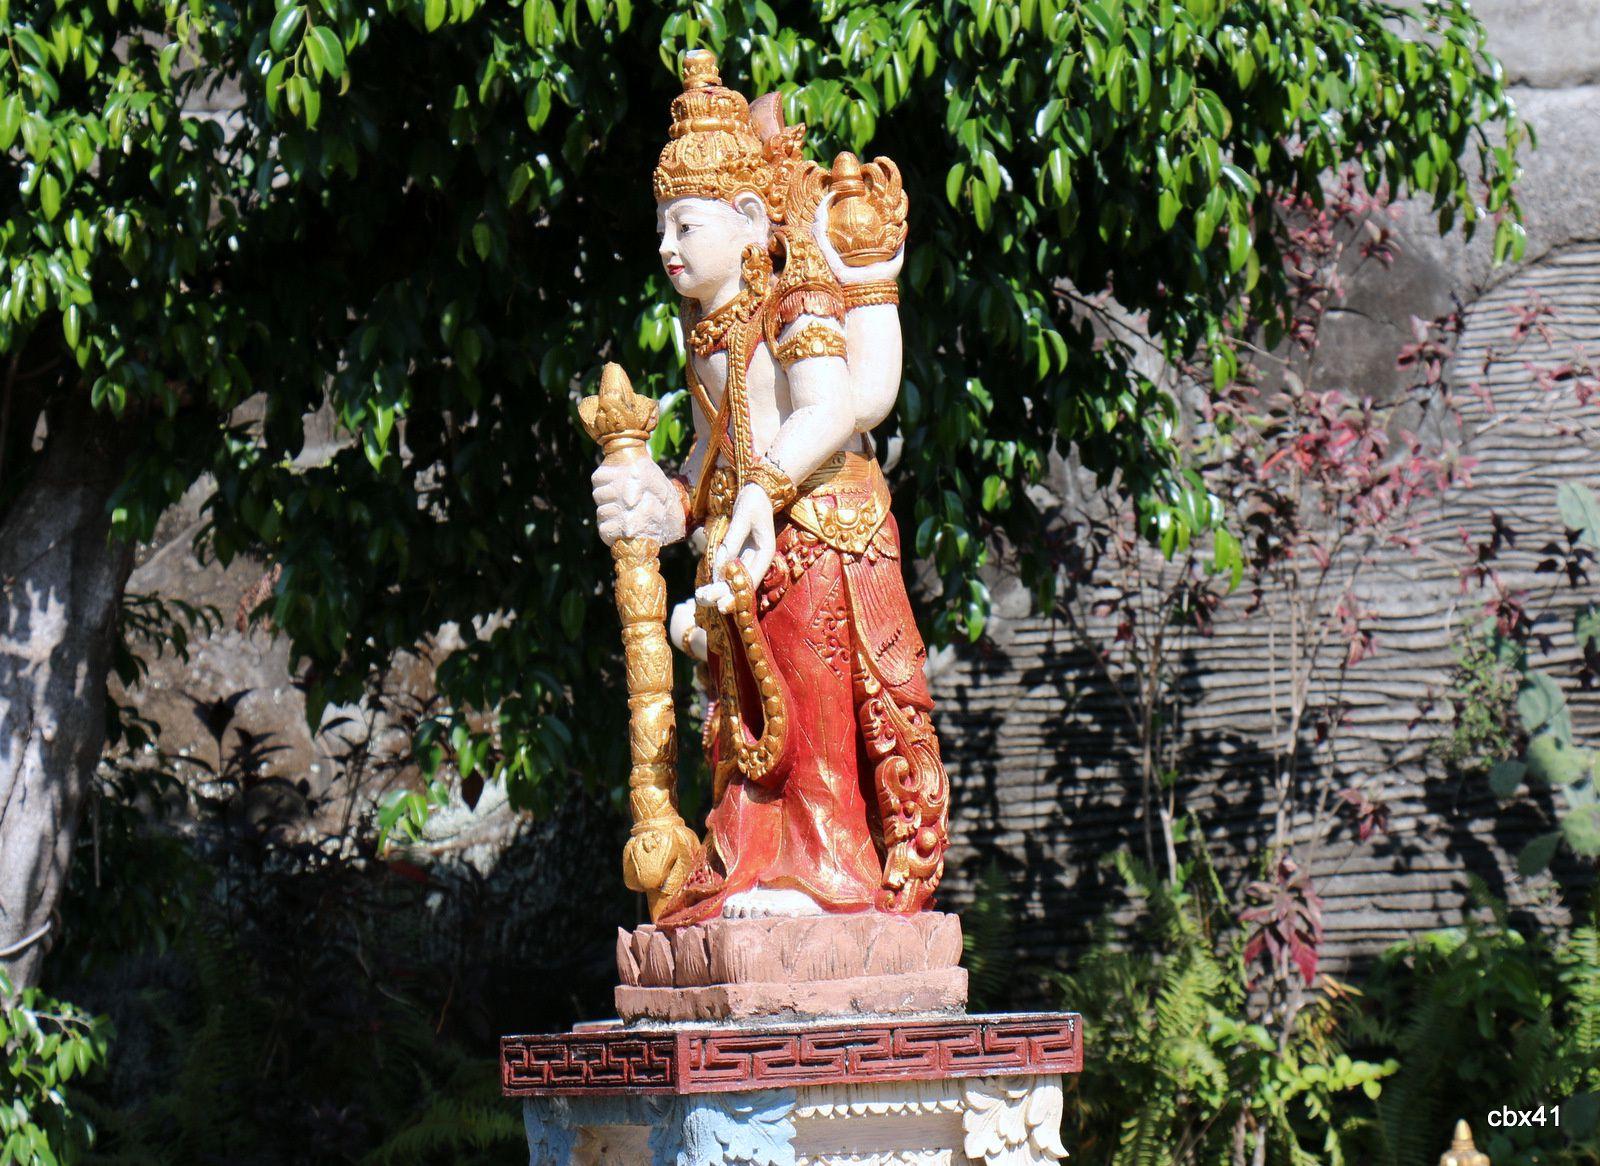 Monastère Brahma Vihara Arama (Bali), Stupa